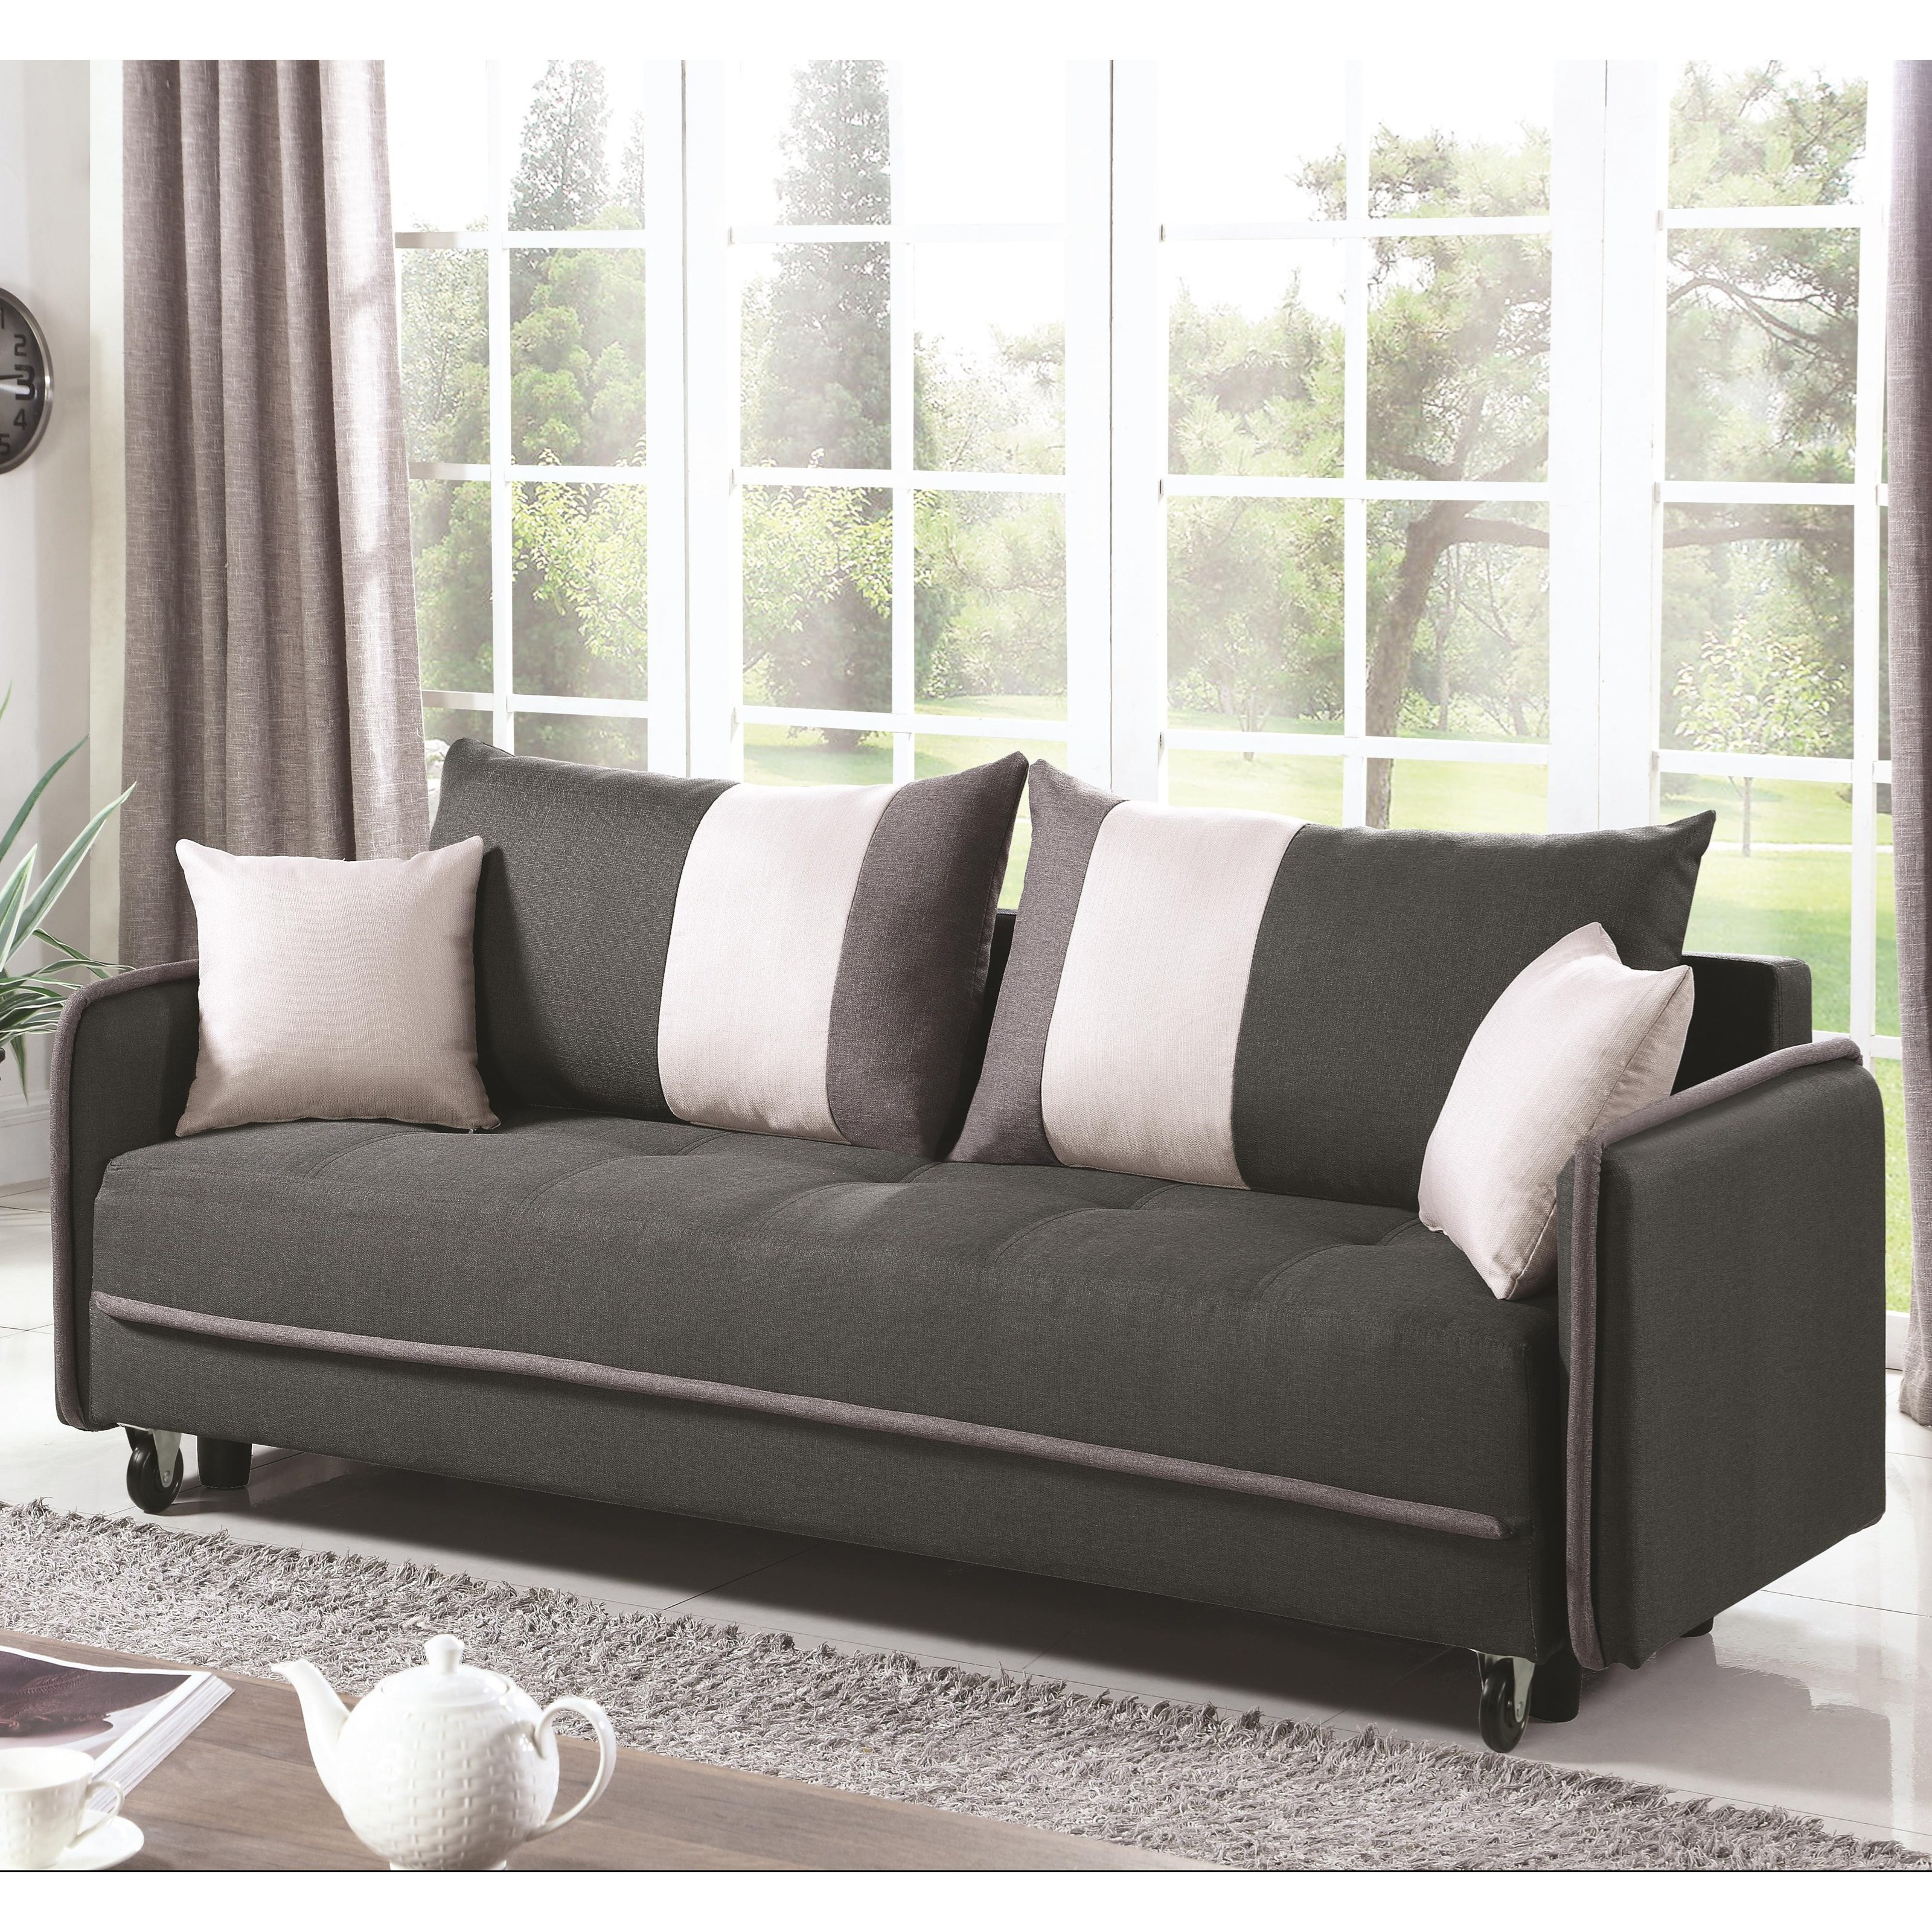 Coaster Sofa Beds And Futons Casual Convertible Sofa Value City